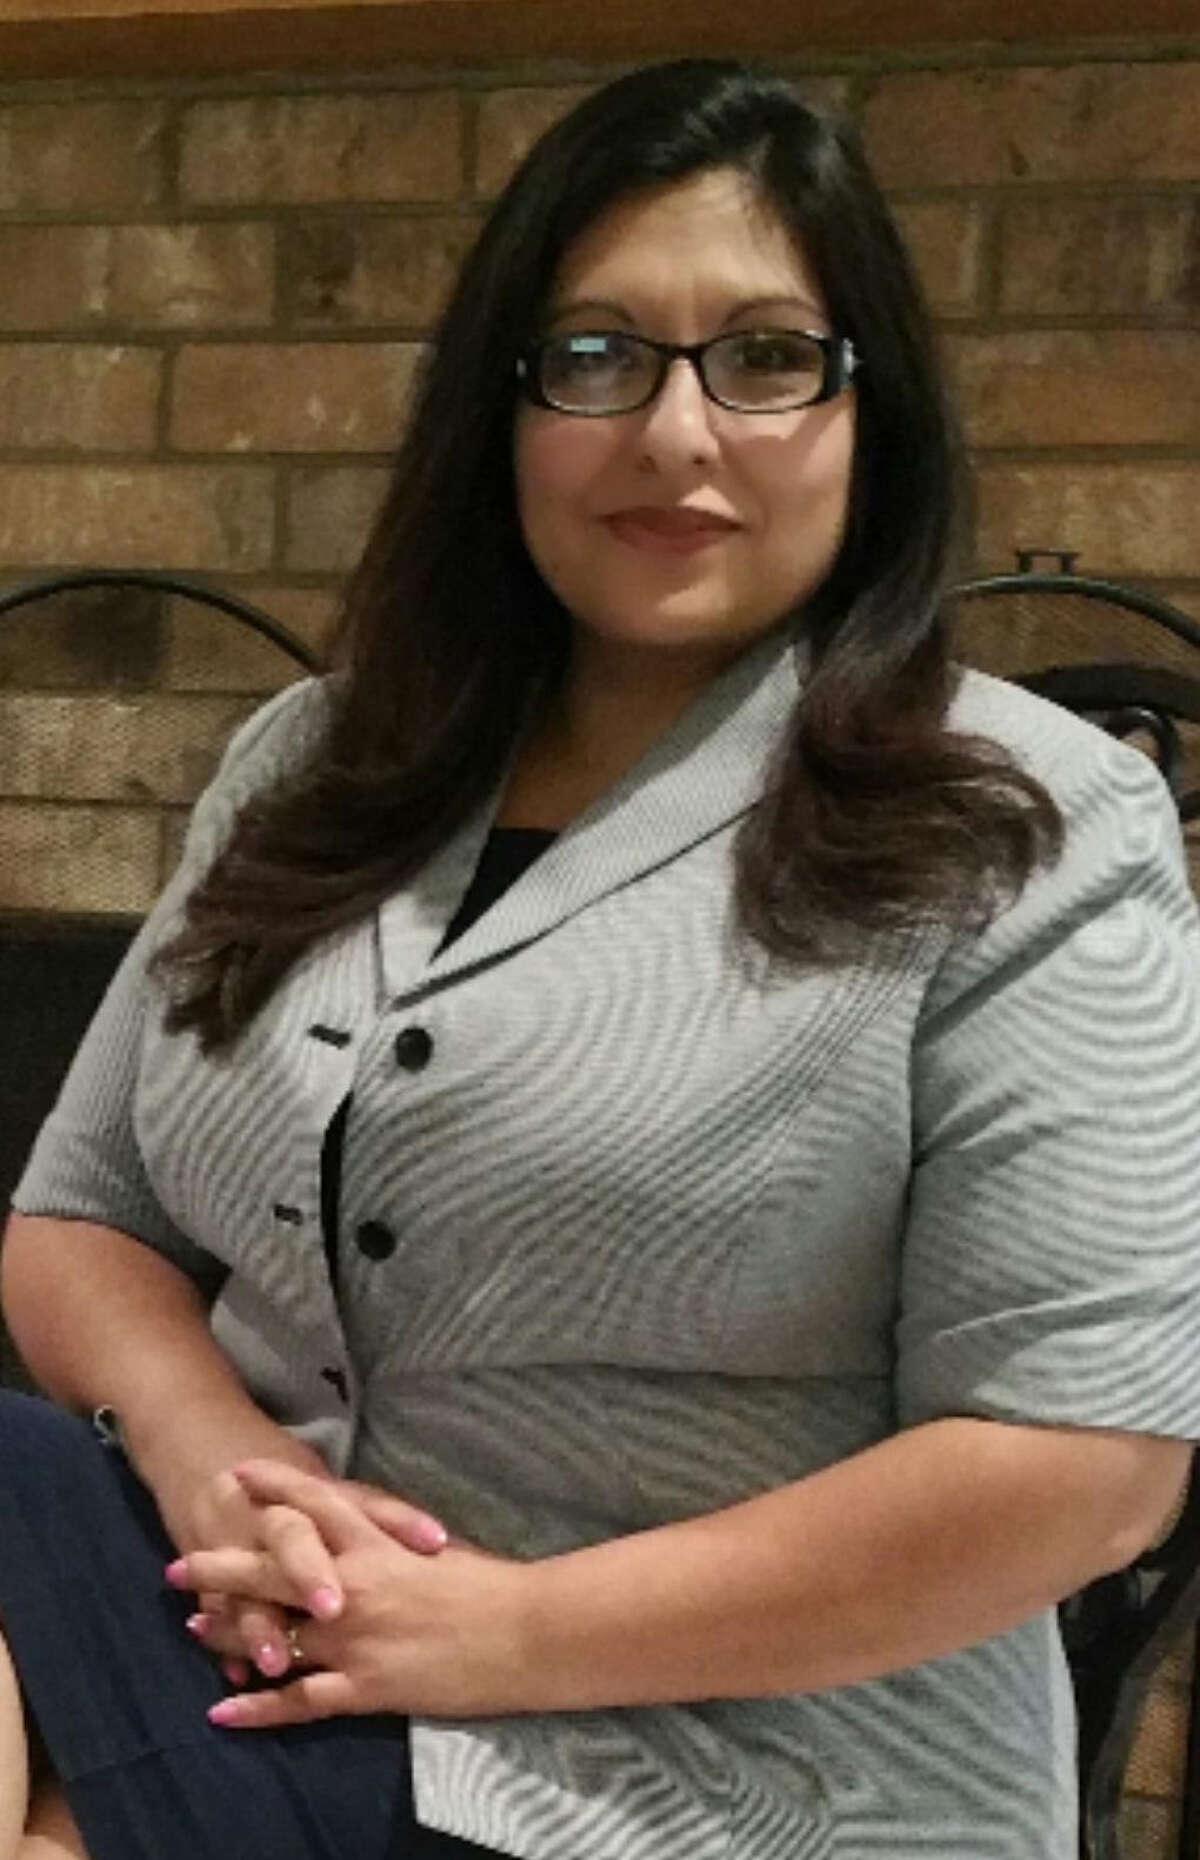 Dominique Garcia, candidate for US Representative for Texas District 29.